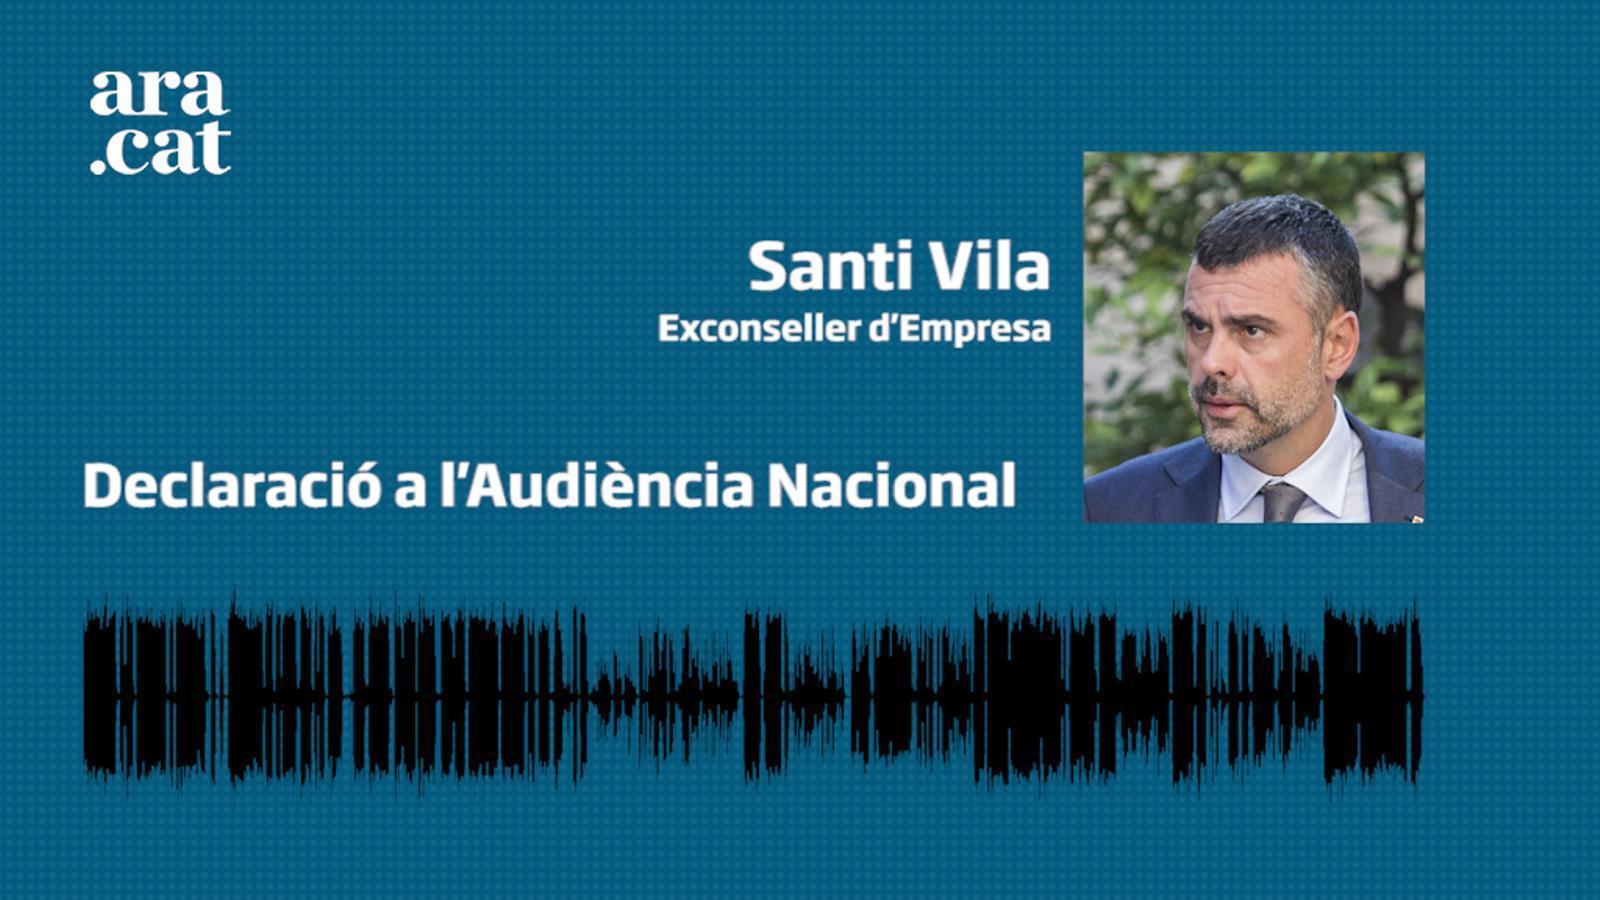 Santi Vila declara a l'Audiència Nacional - testimoni 2